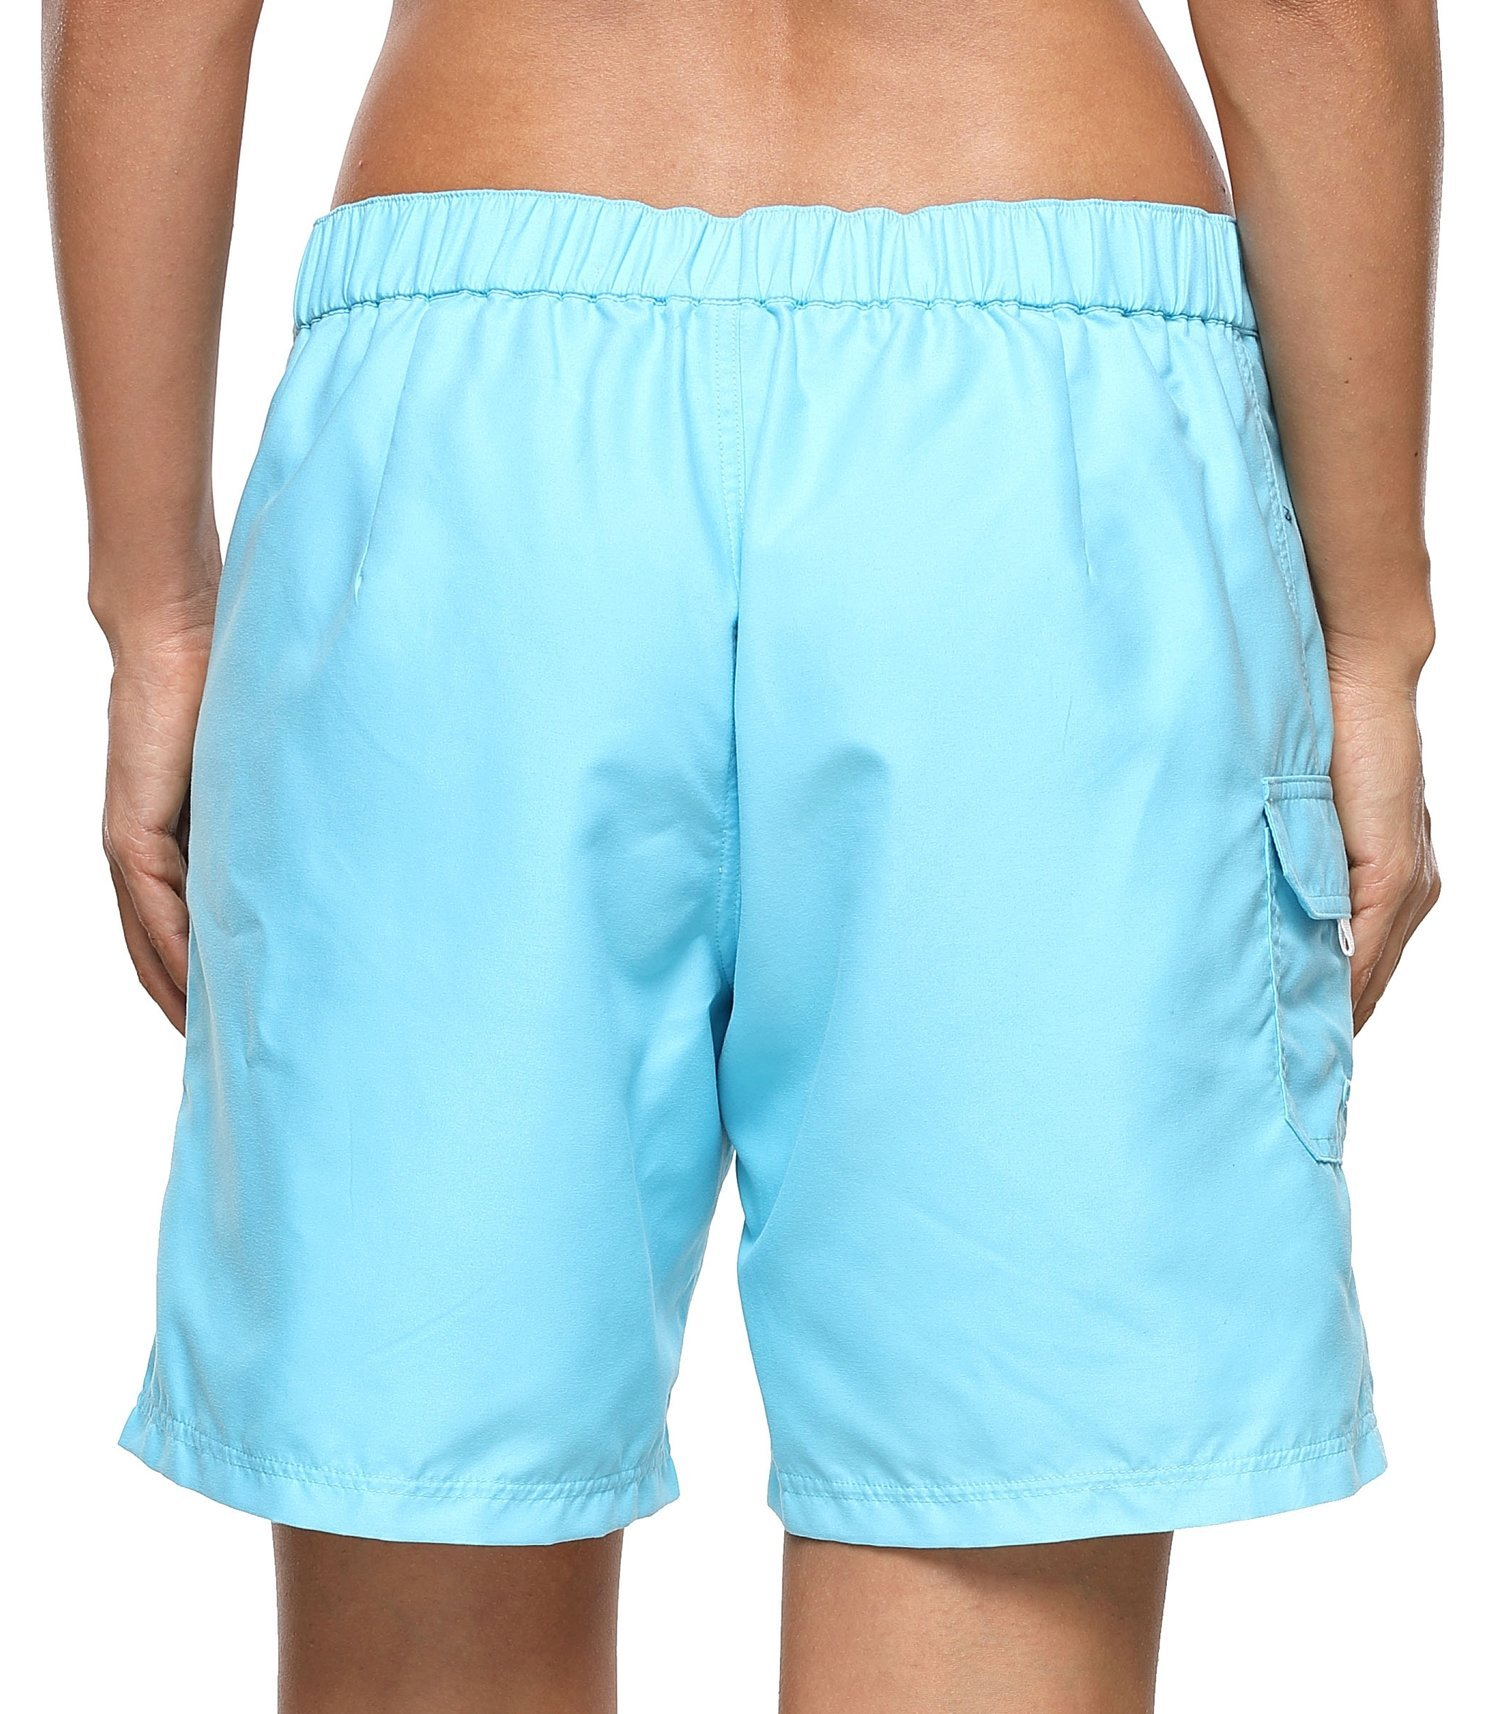 ATTRACO Women's Long Board Short Side Pocket Drawstring Swimwear Shorts Blue Large by ATTRACO (Image #2)